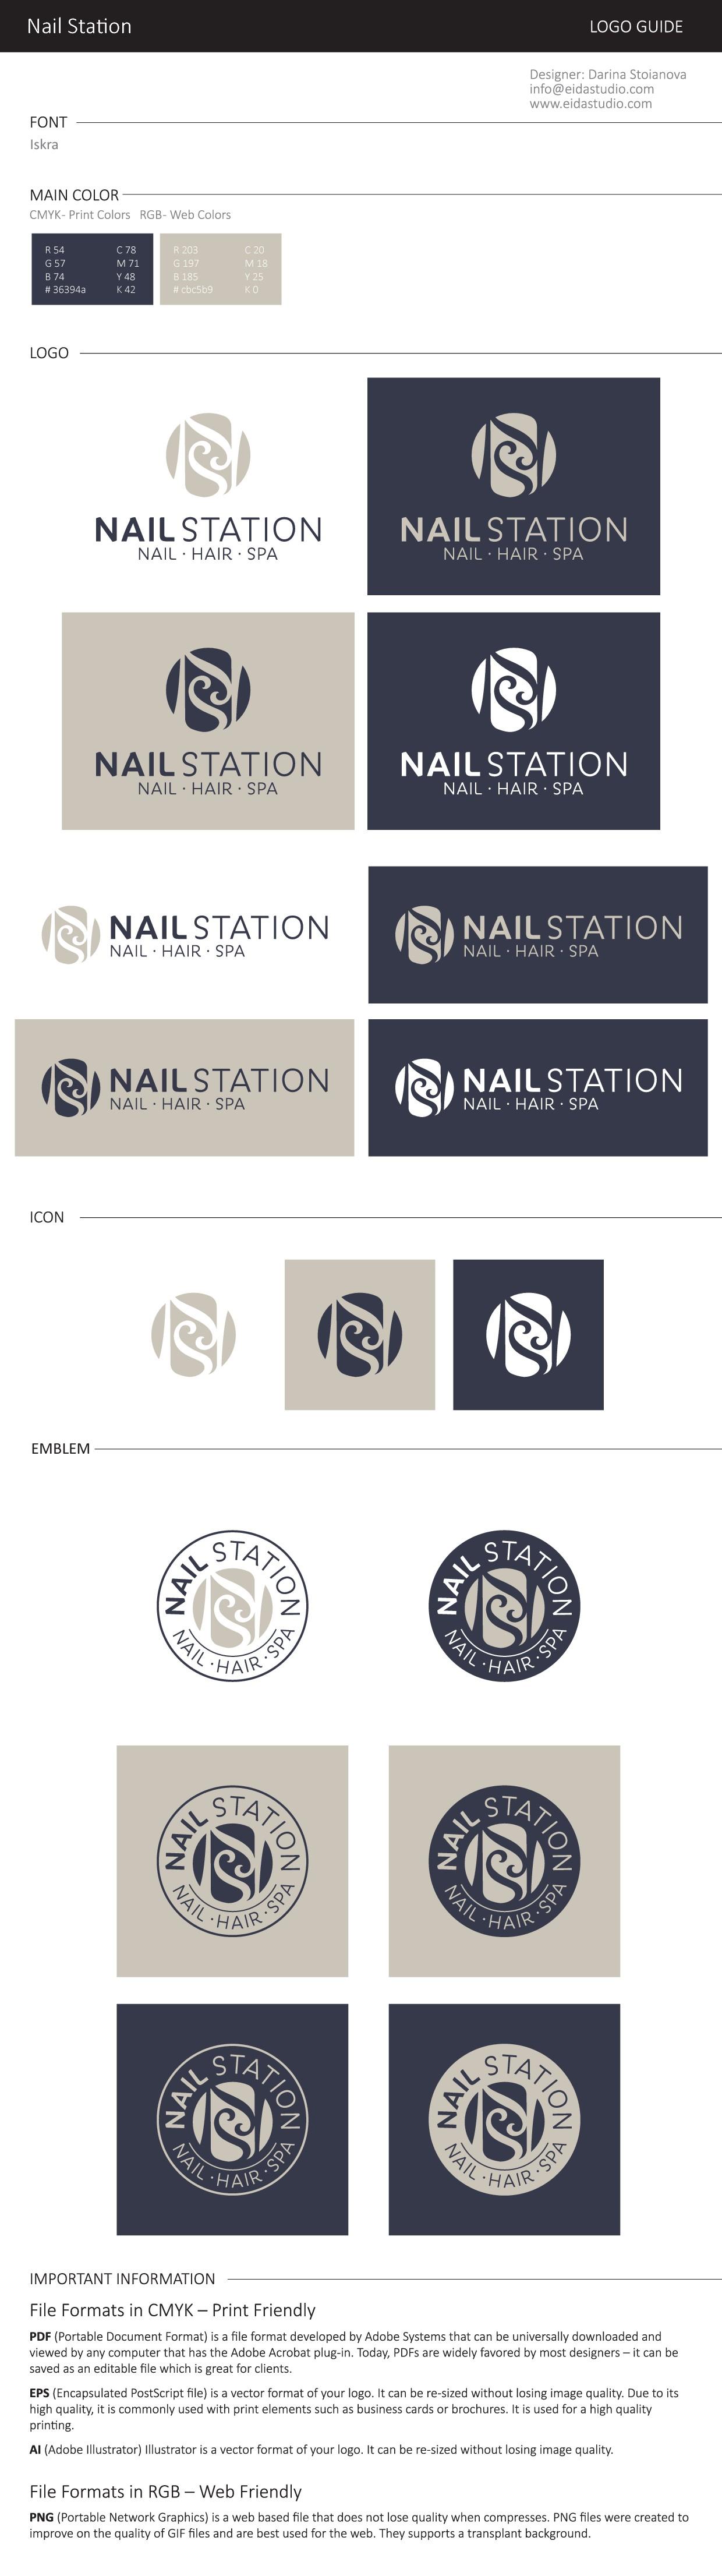 "Design luxury modern logo for my salon ""Nail Station"" ,"